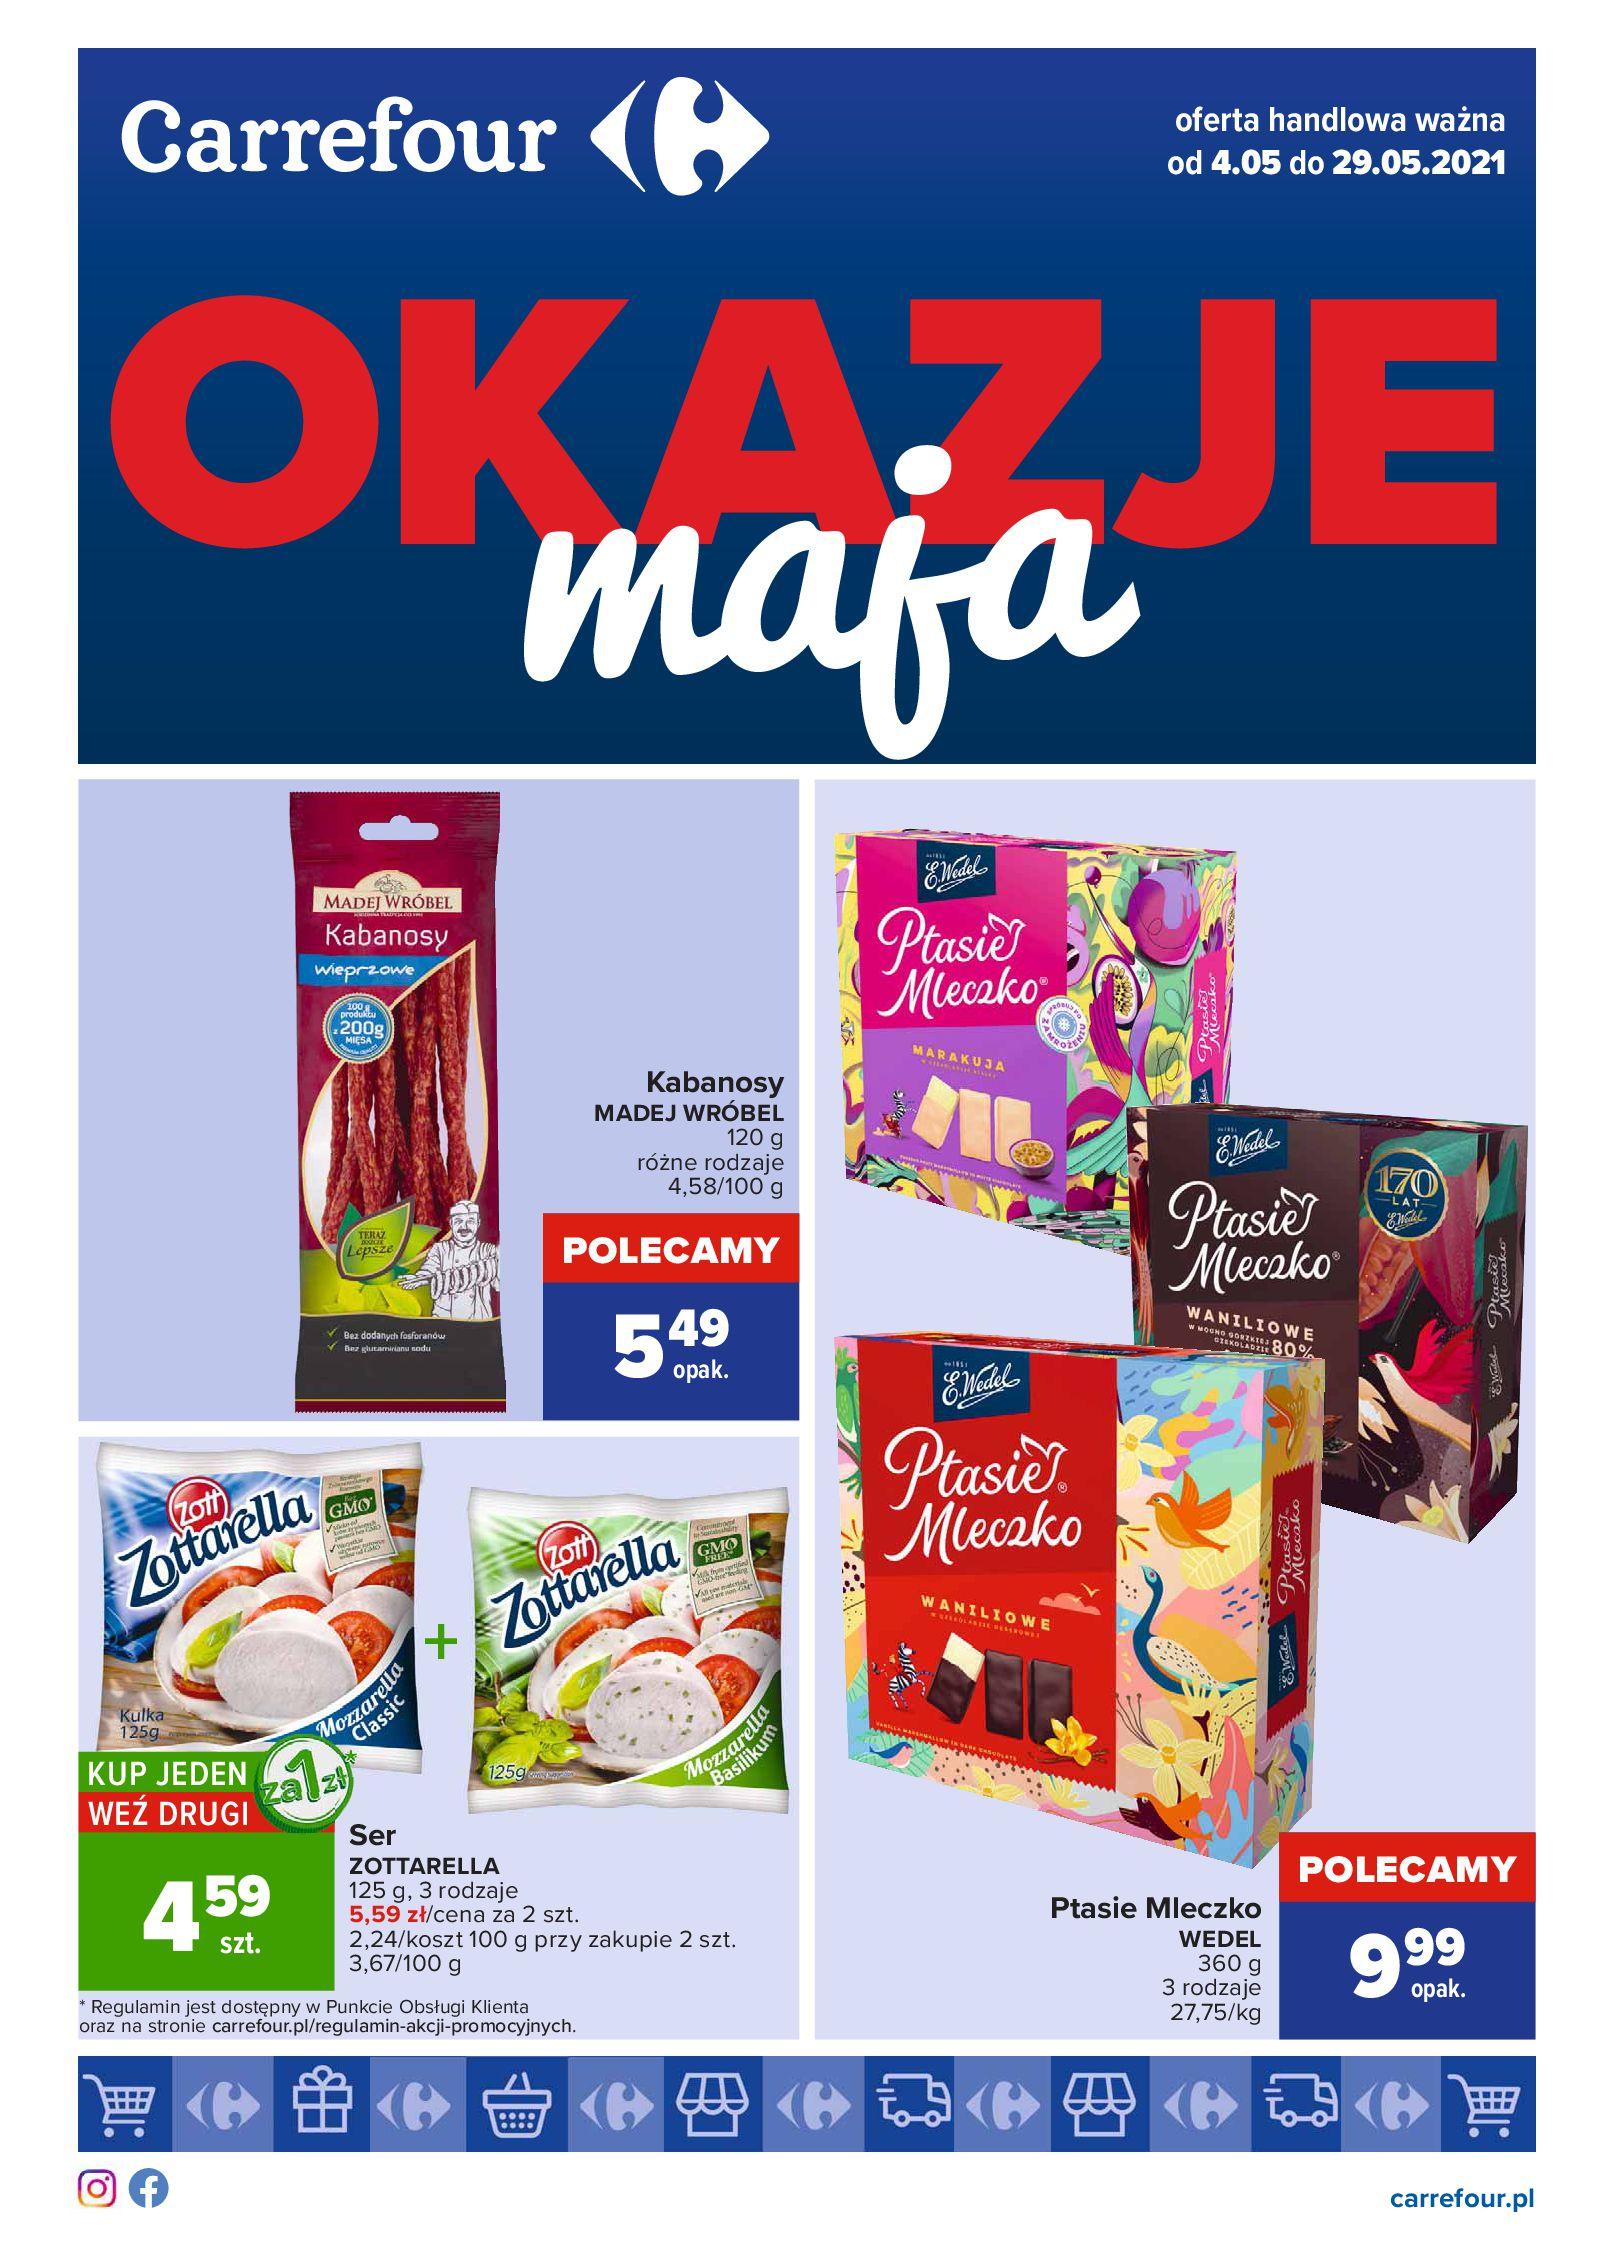 Carrefour:  Okazje maja 03.05.2021